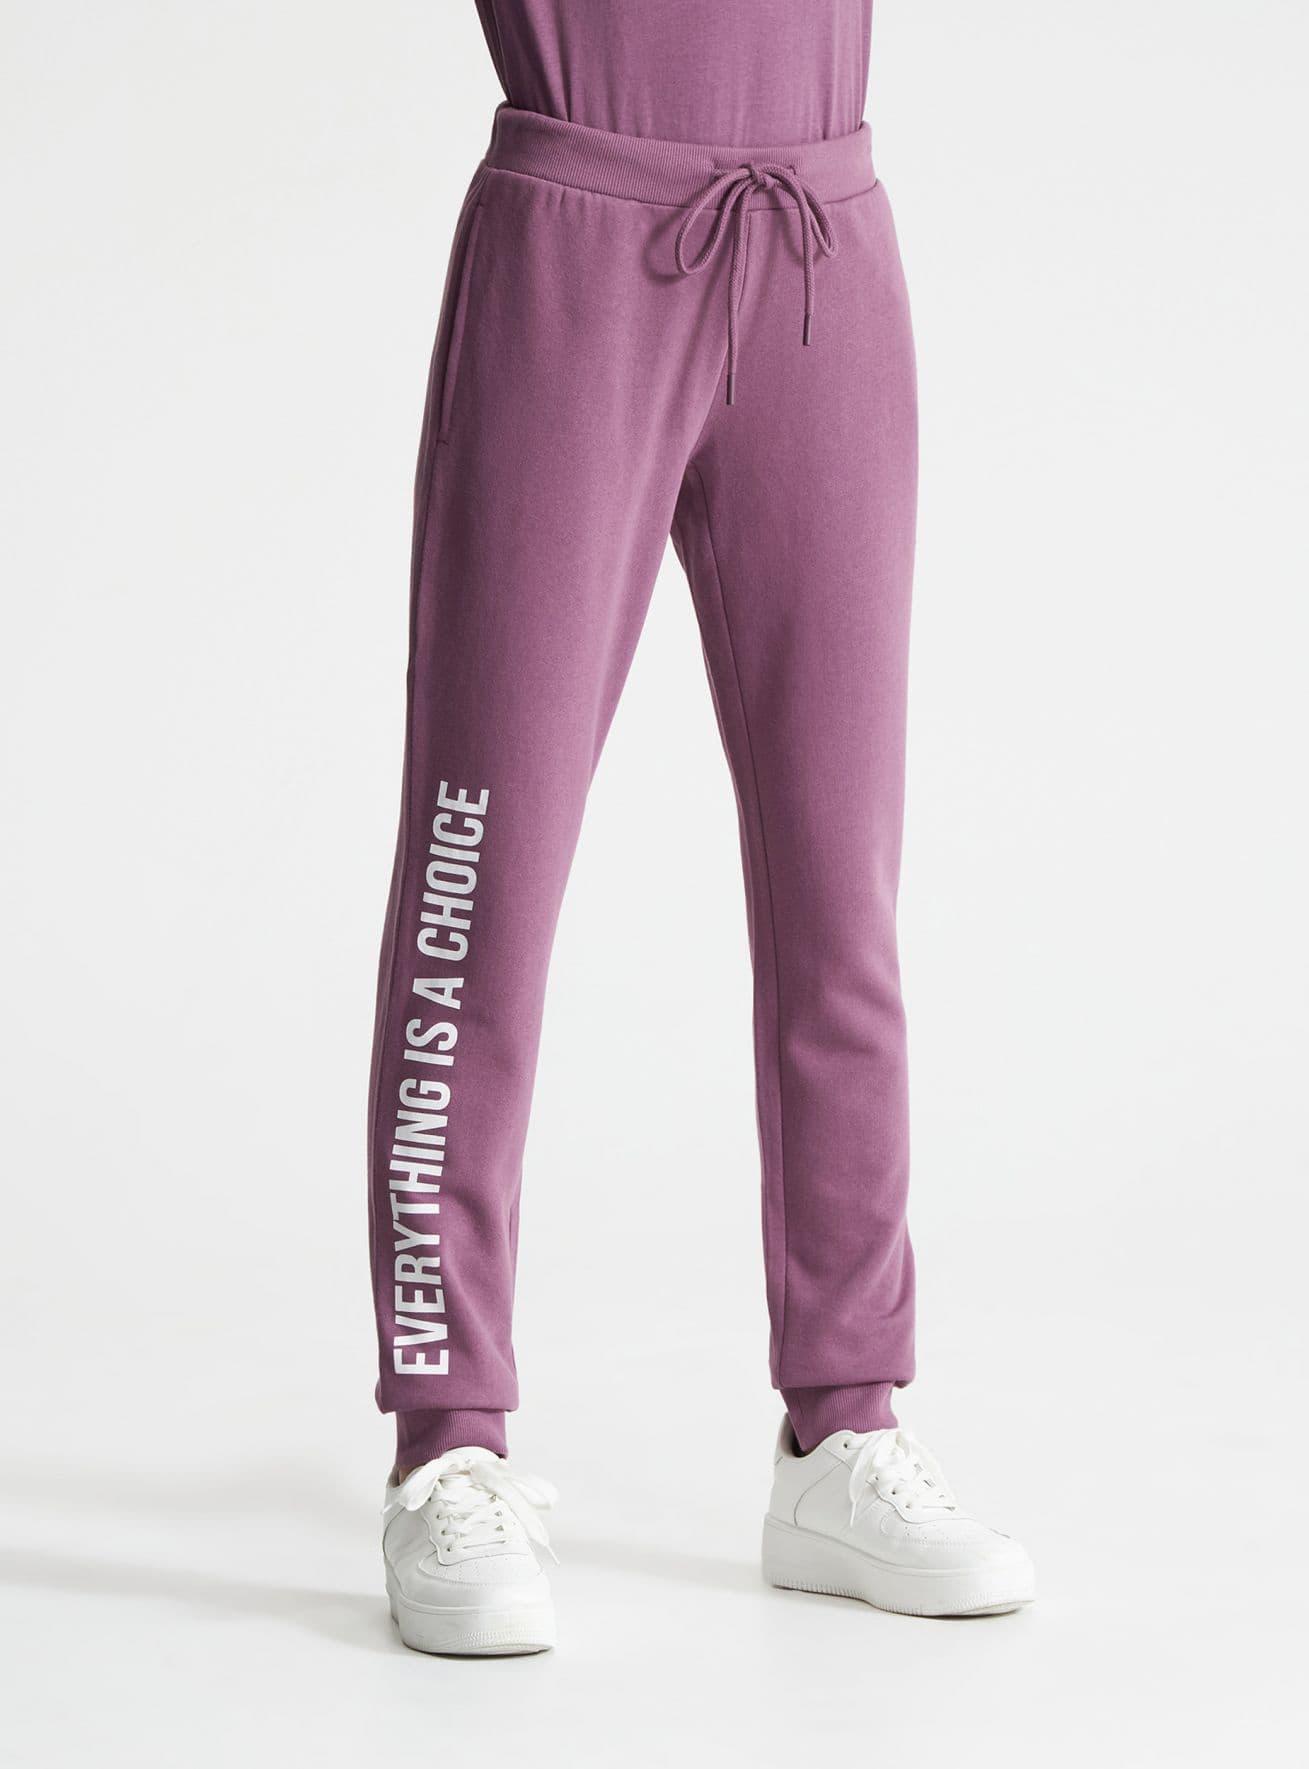 Pantalone ginnico Lungo Donna Terranova